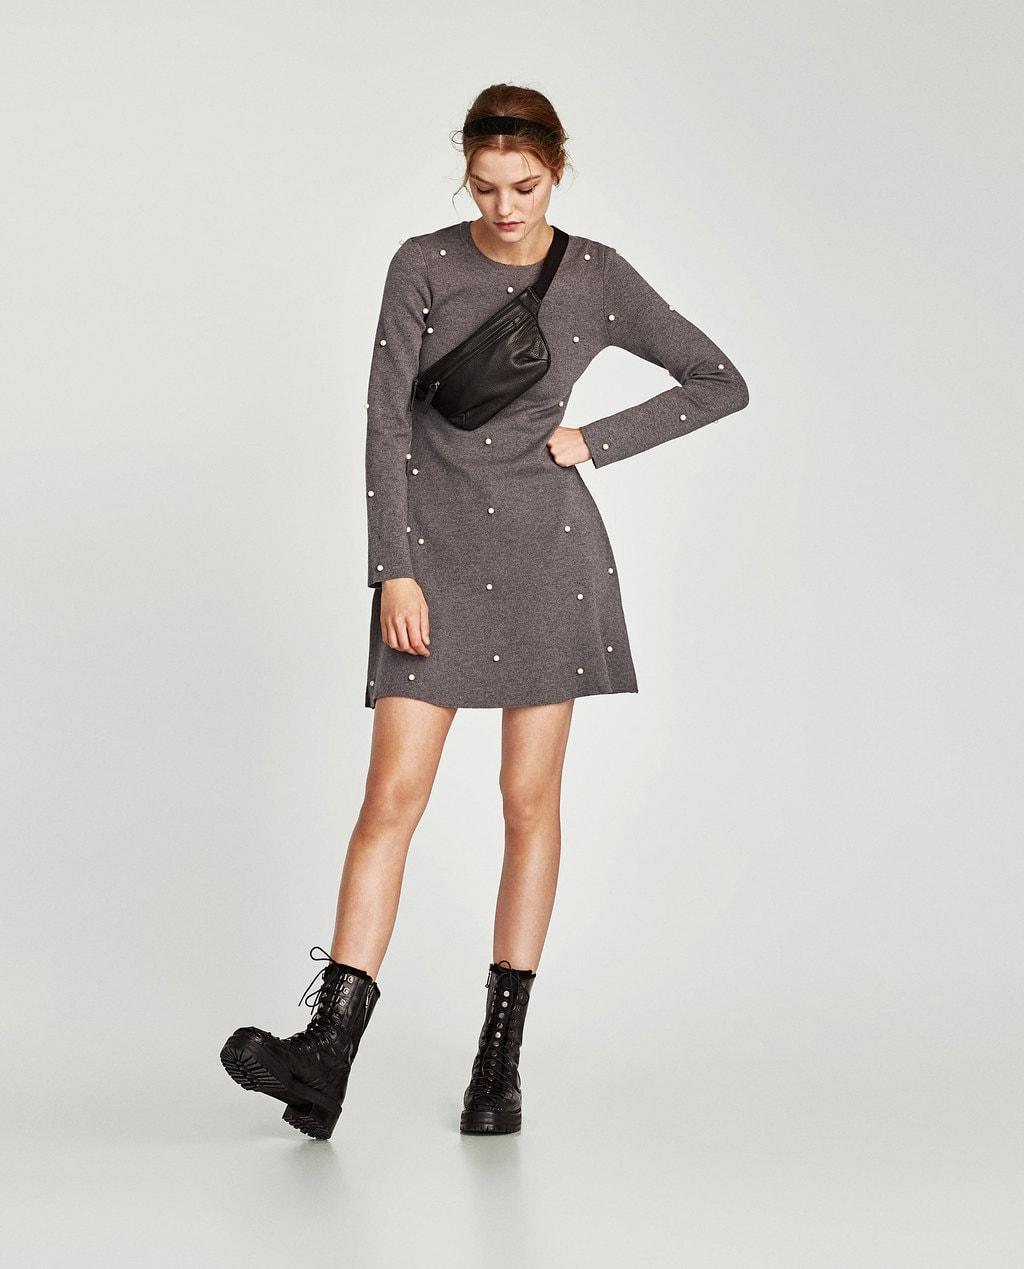 Photo of model standing against light gray background wearing medium-dark  gray heathered long- ae74b350e